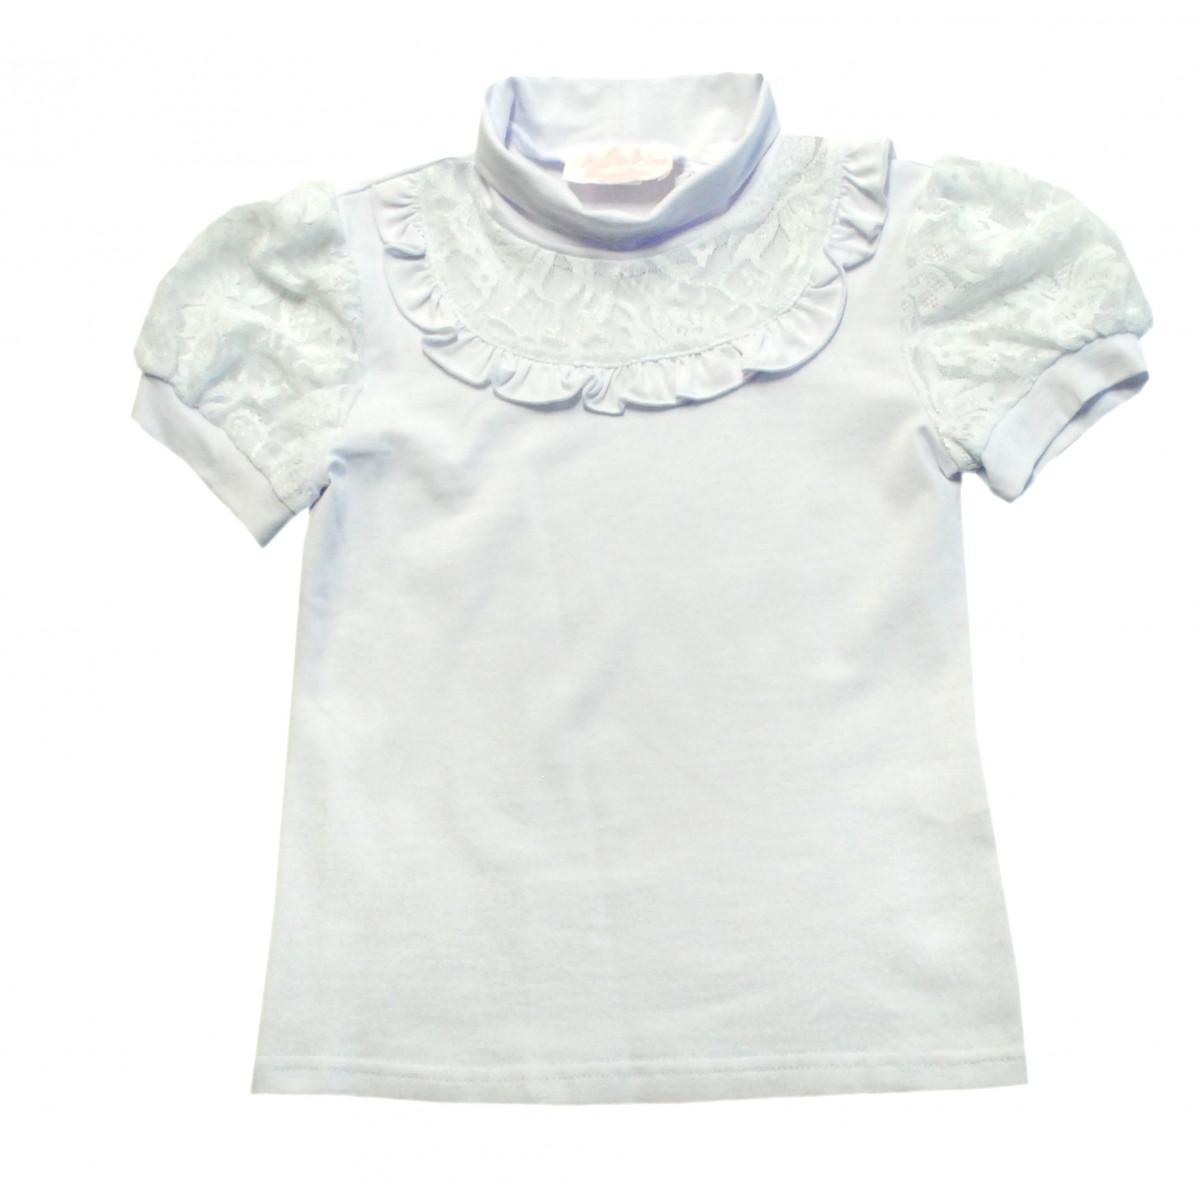 Блузка трикотажная с коротким рукавом.